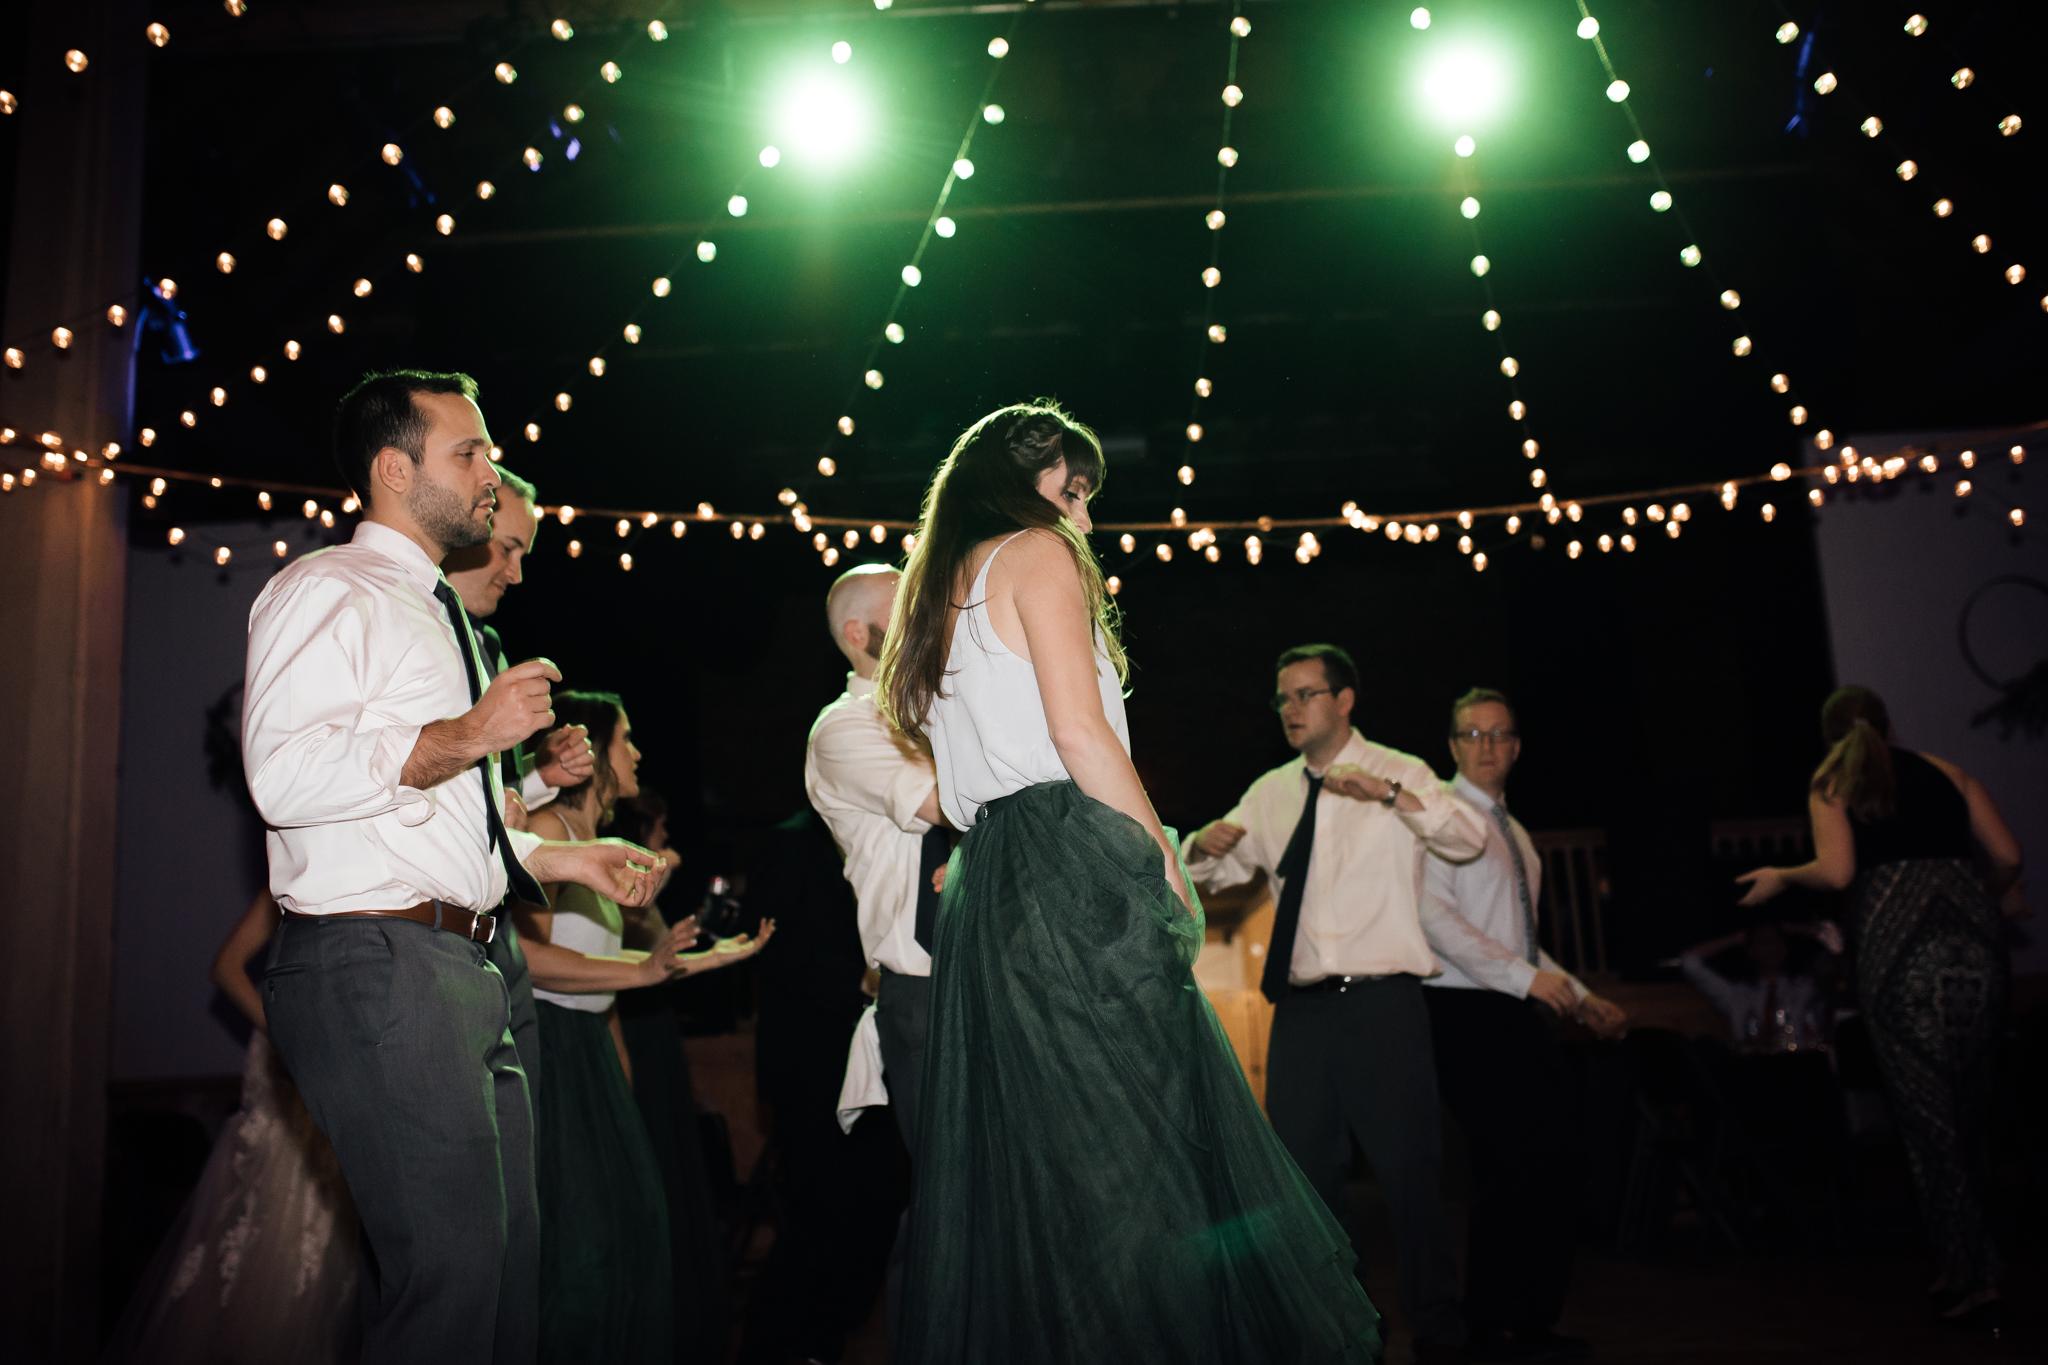 birmingham-alabama-wedding-photographer-laura-terry-the-warmth-around-you (108 of 110).jpg